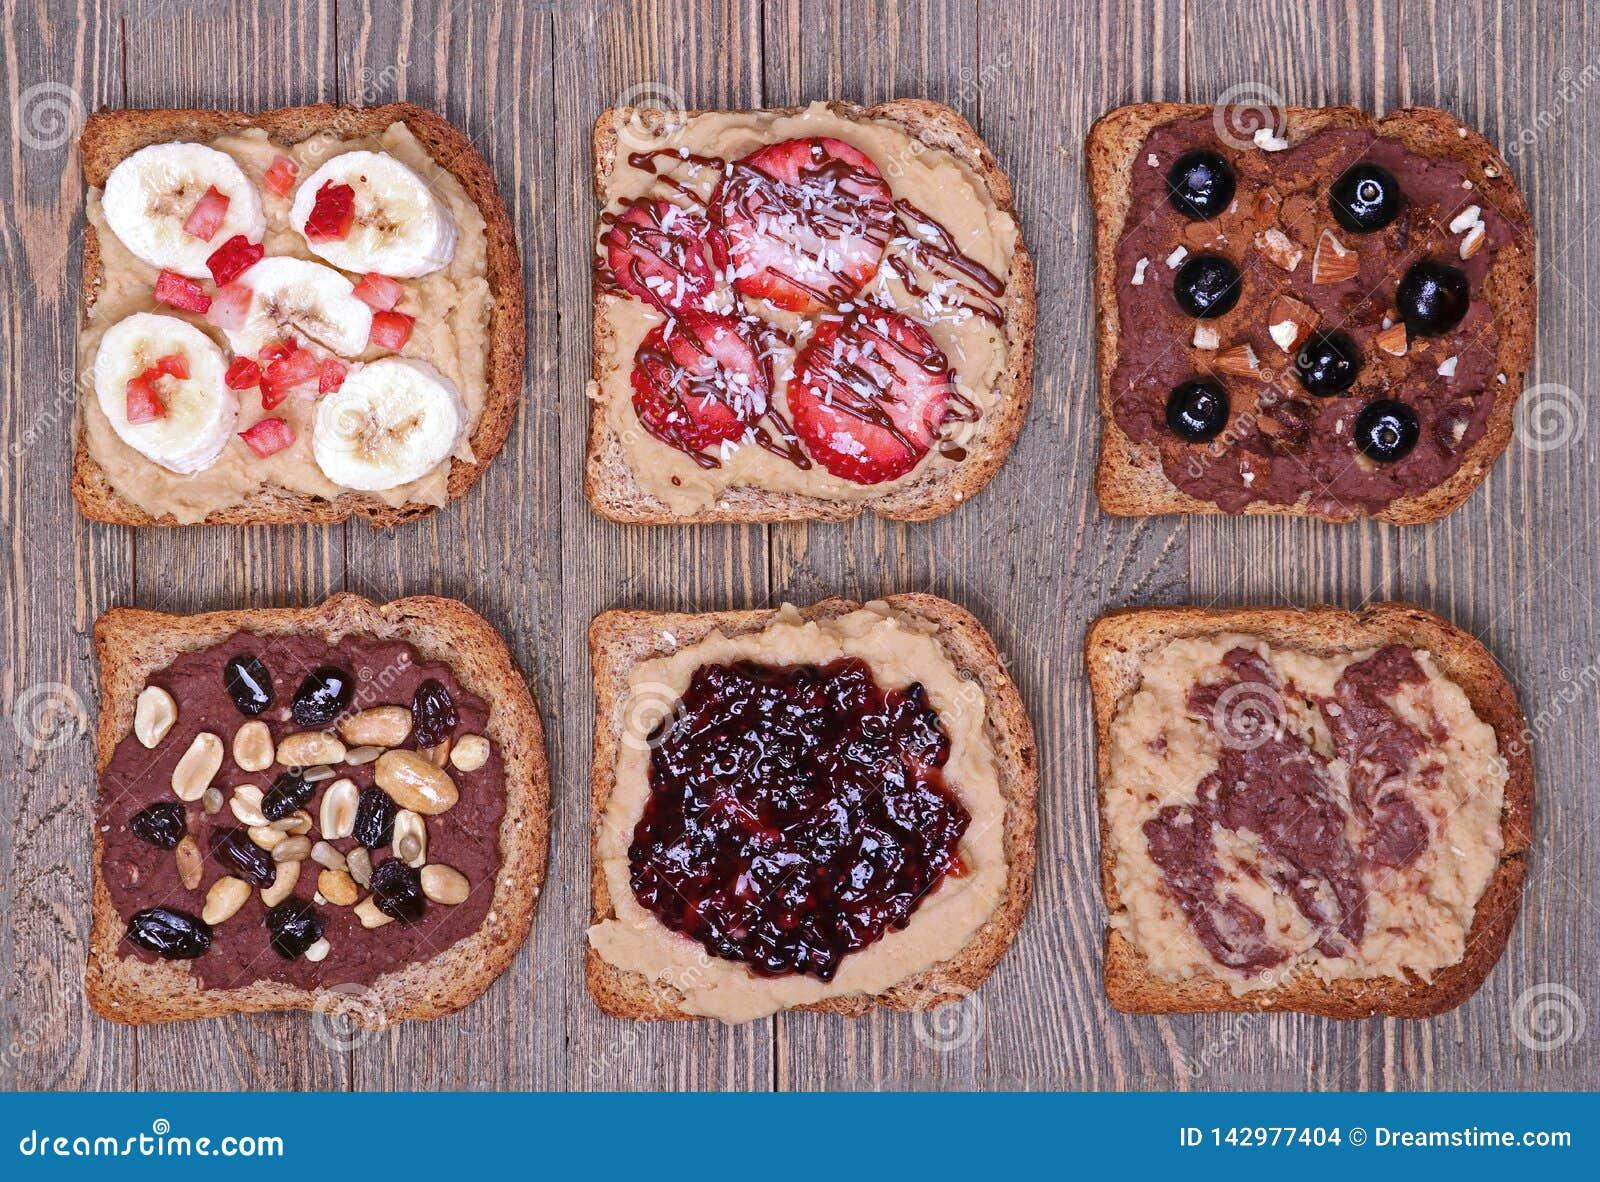 Healthy desserts on whole grain toast